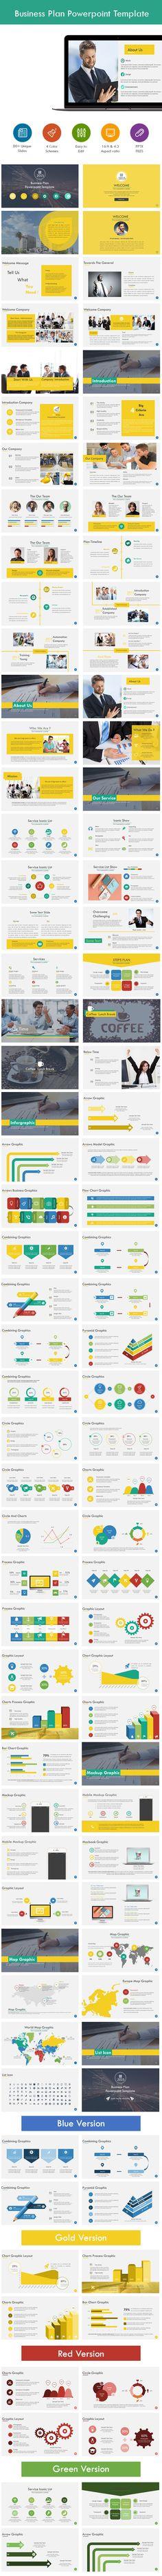 Business Plan Powerpoint Template #design Download: http://graphicriver.net/item/business-plan-powerpoint-template/12264155?ref=ksioks